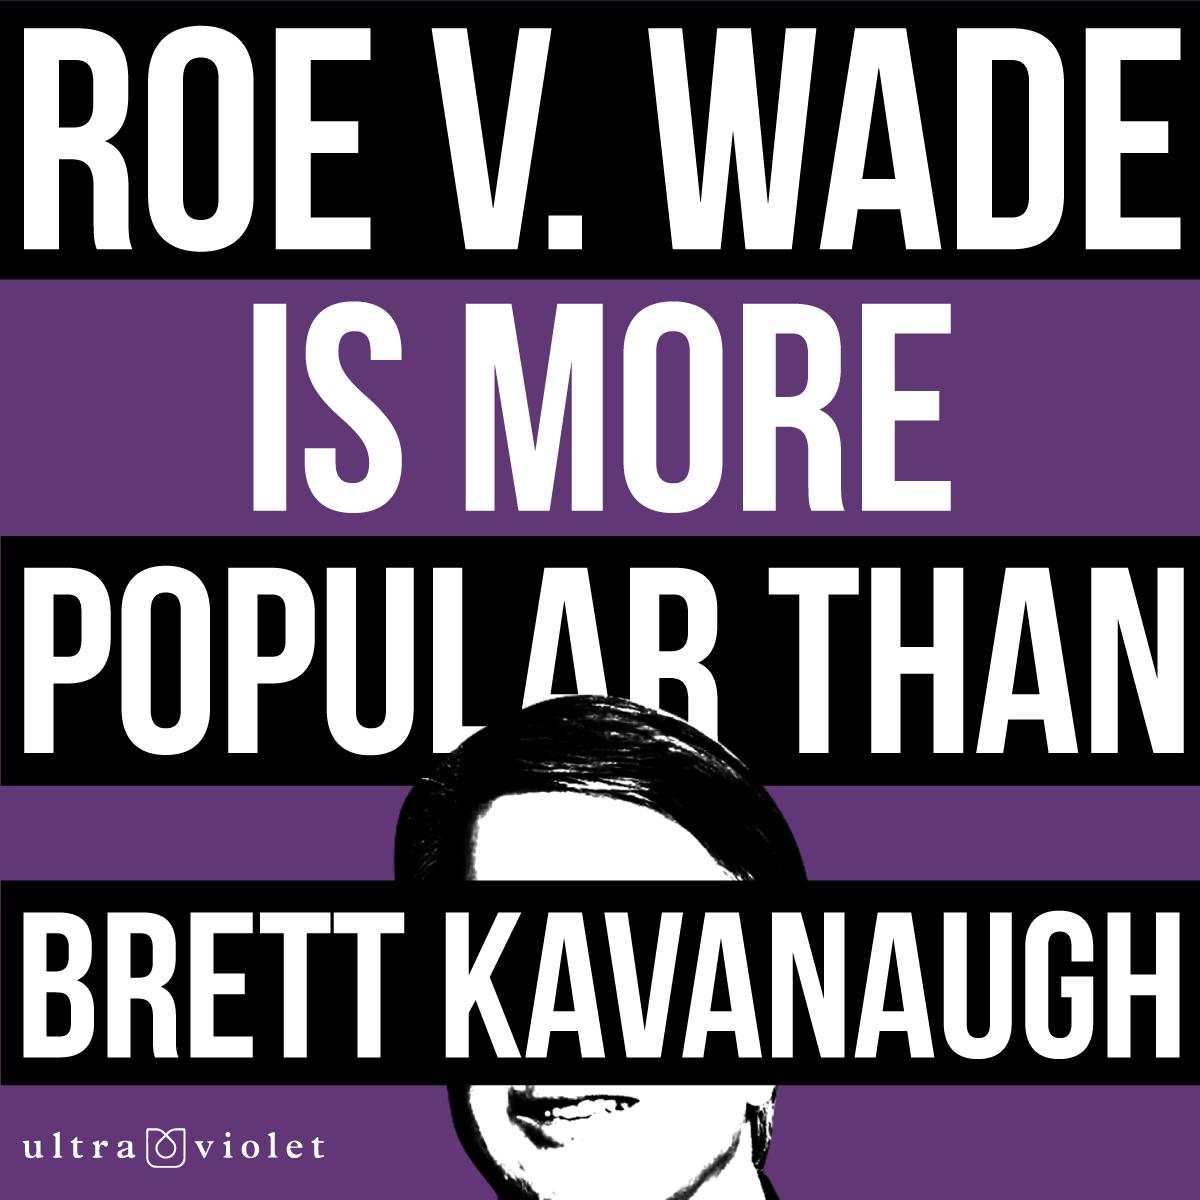 Roe v. Wade is more popular than Brett Kavanaugh